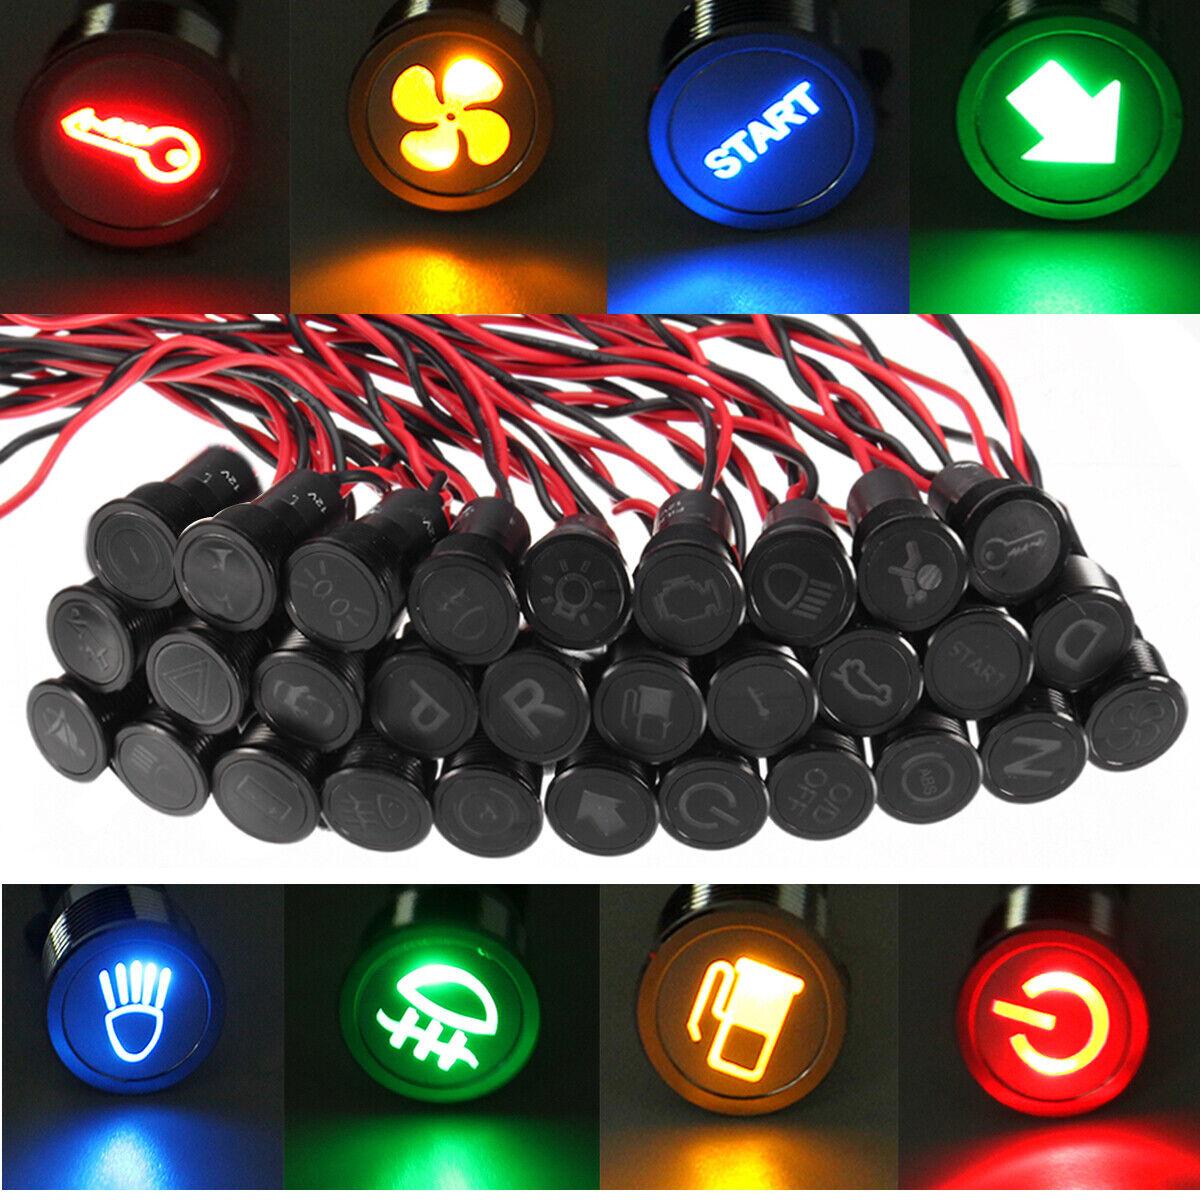 2Pcs Silver Vaorwne Dynamic Smoke LED Side Marker Signal Light for 207 308 3008 5008 for C3 C4 C5 Car Turn Signal Lamp